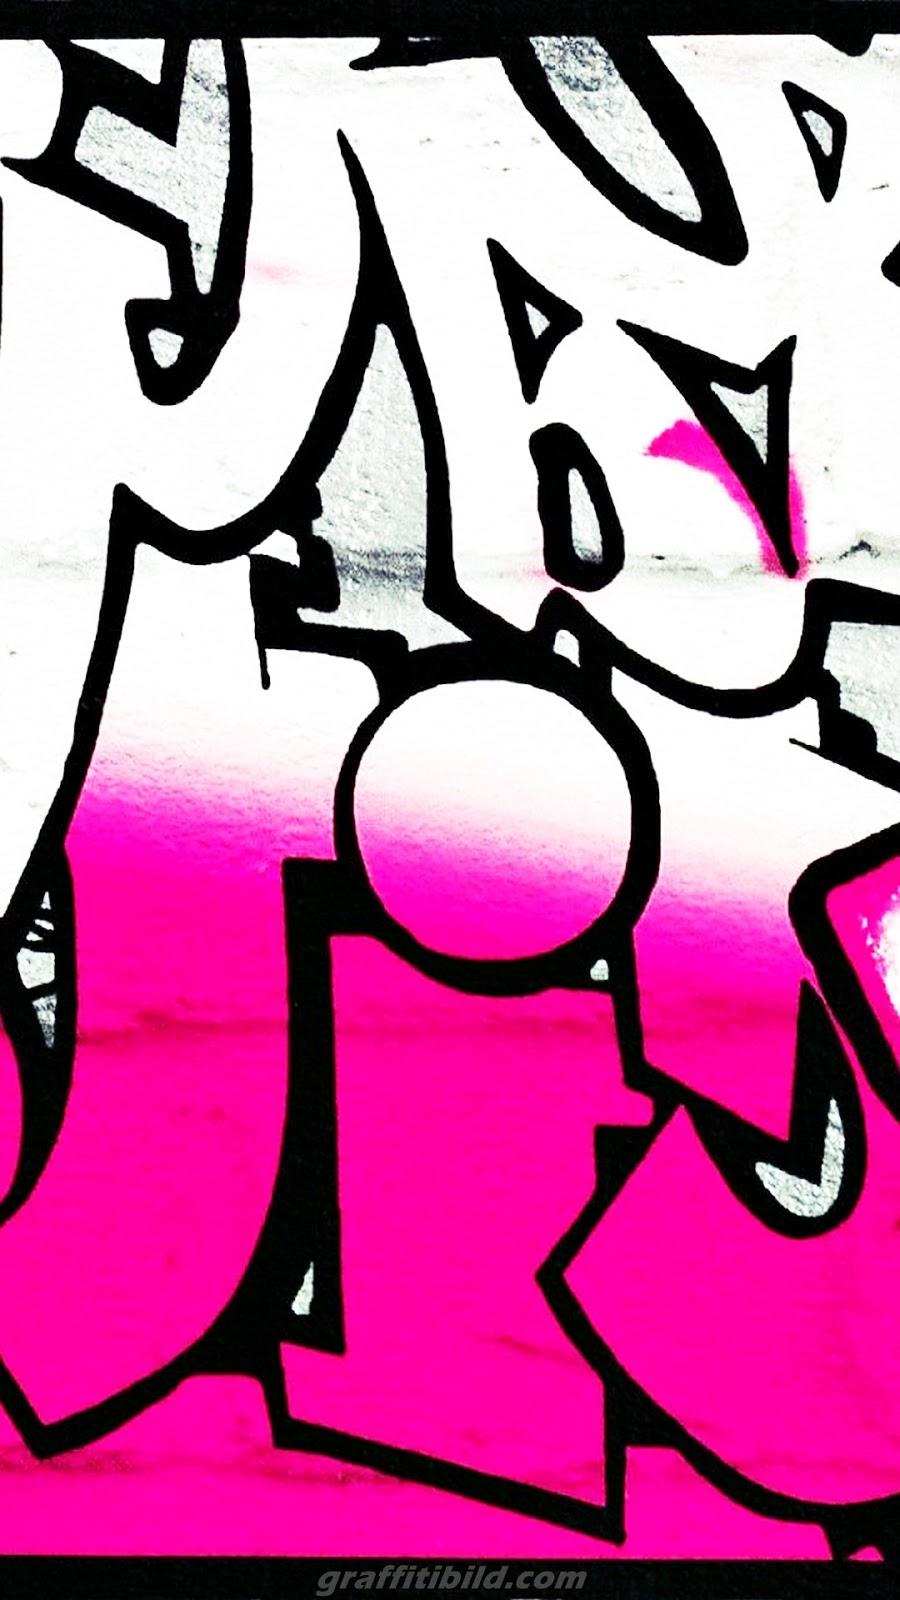 graffiti wallpaper hd android, graffiti buchstaben bilder